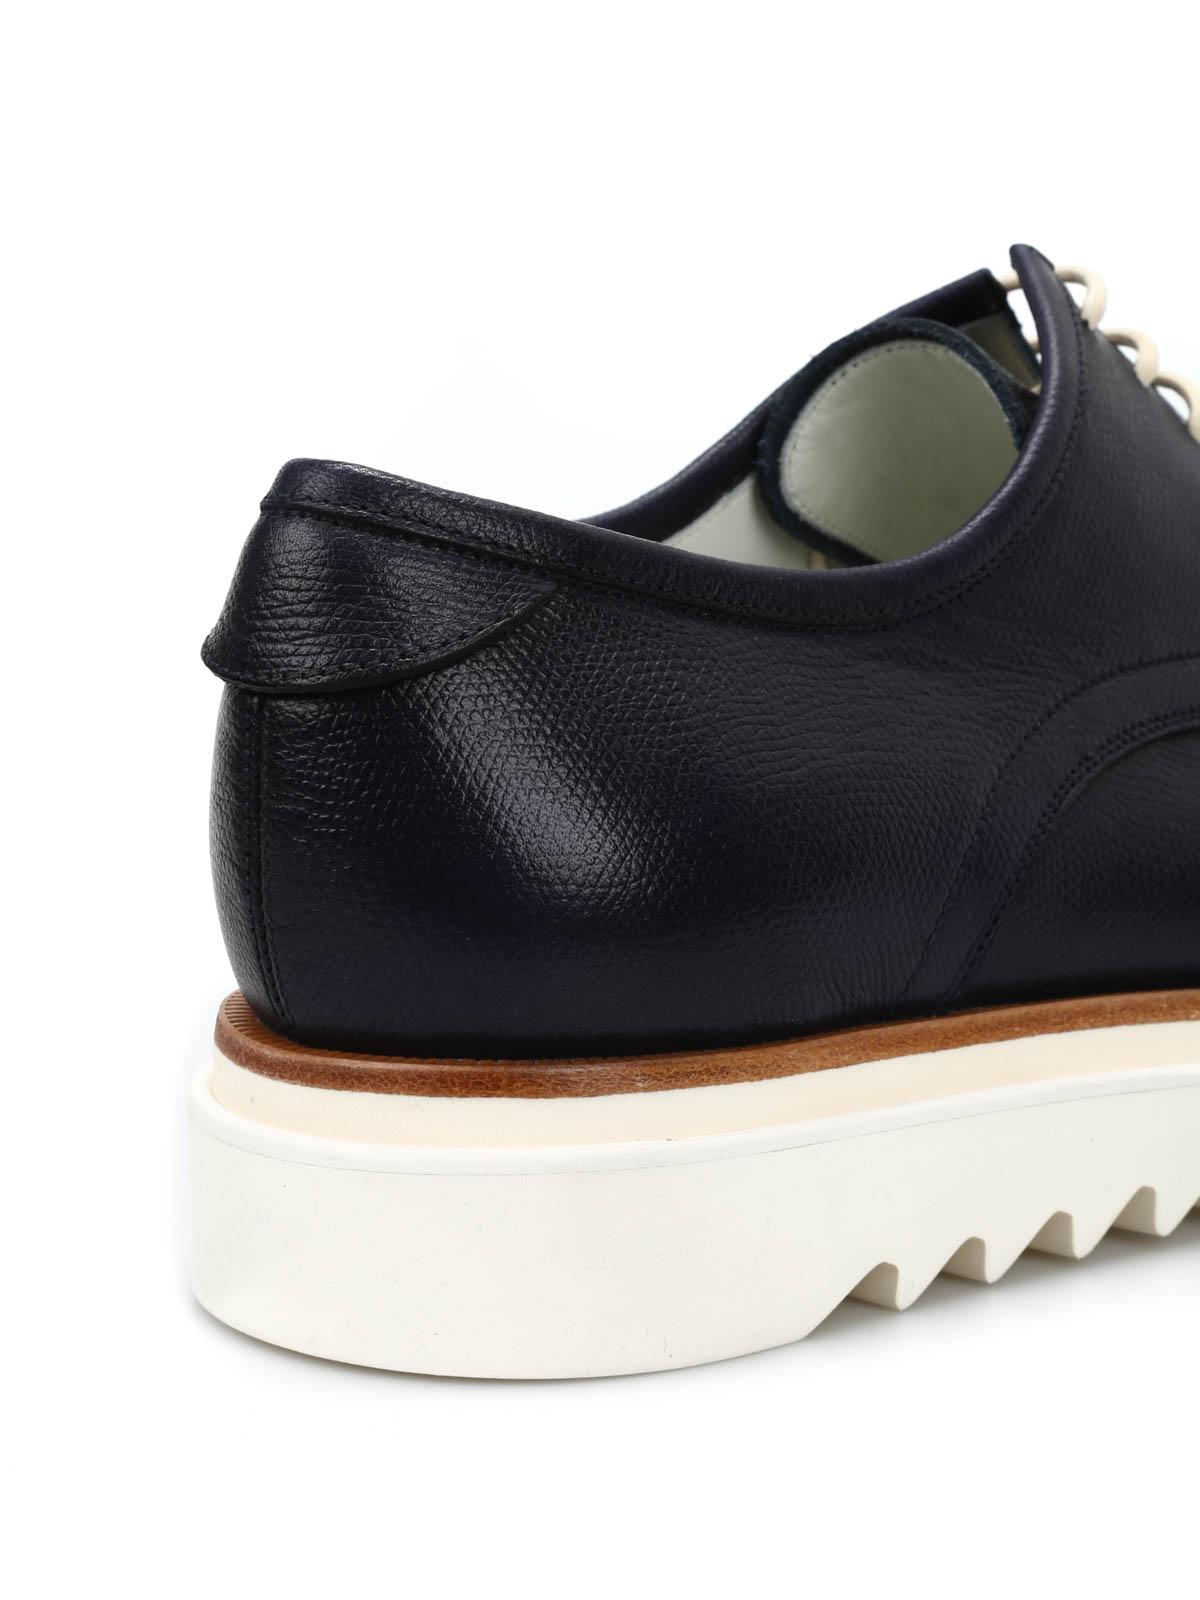 Salvatore Ferragamo Con Zapatos Con Ferragamo Cordones Azules Zapatos con 08d662